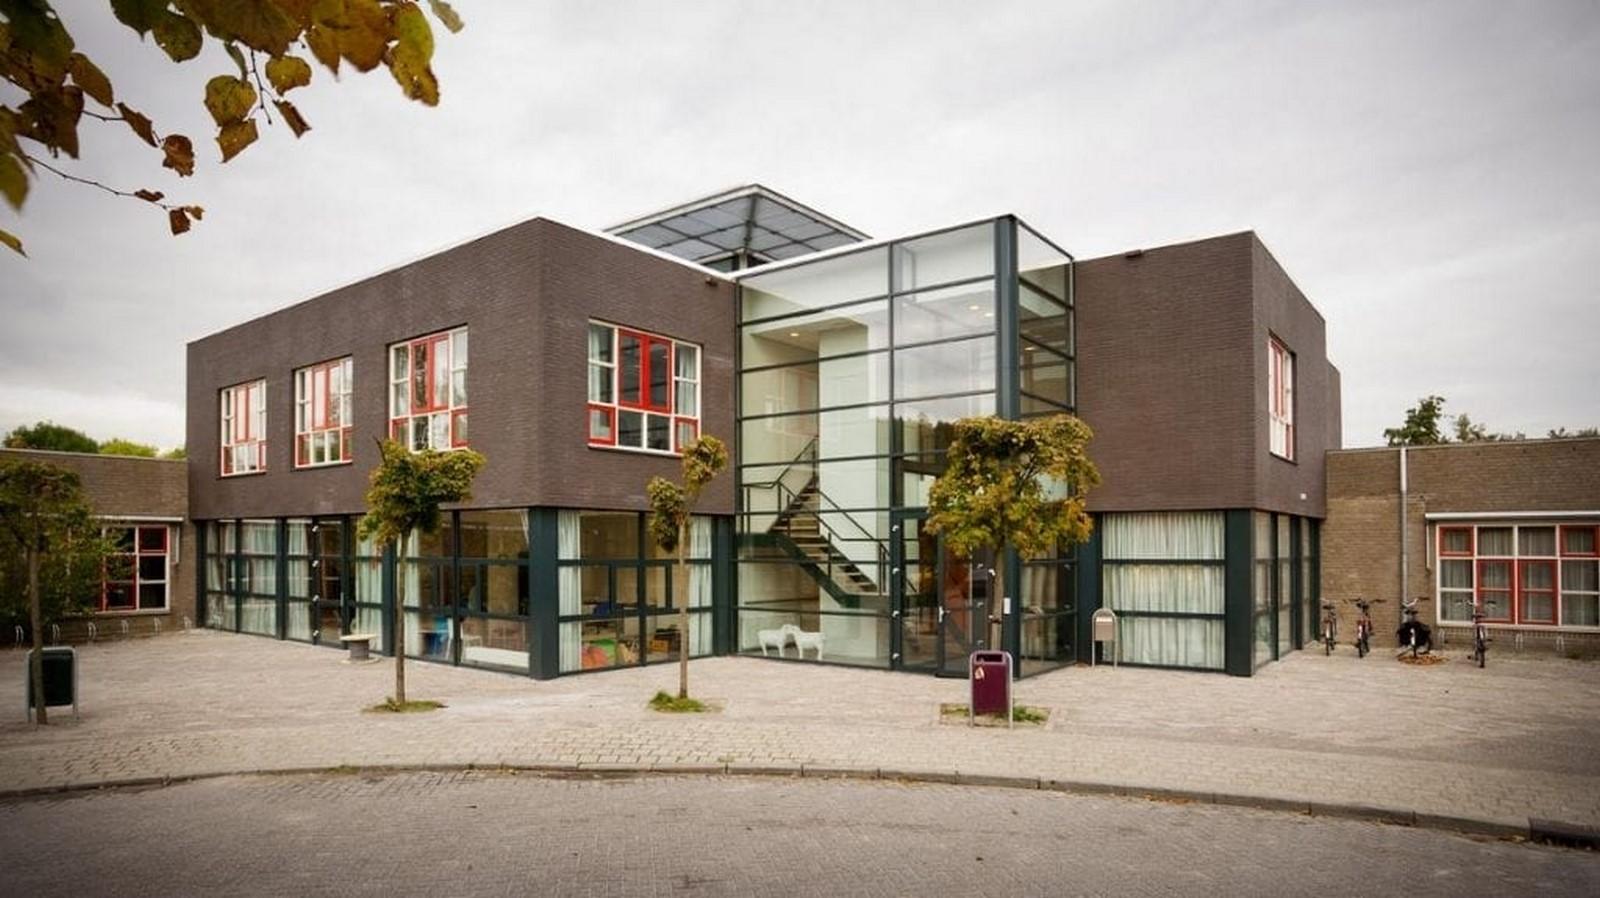 Architects in Breda - Top 55 Architects in Breda - Sheet25